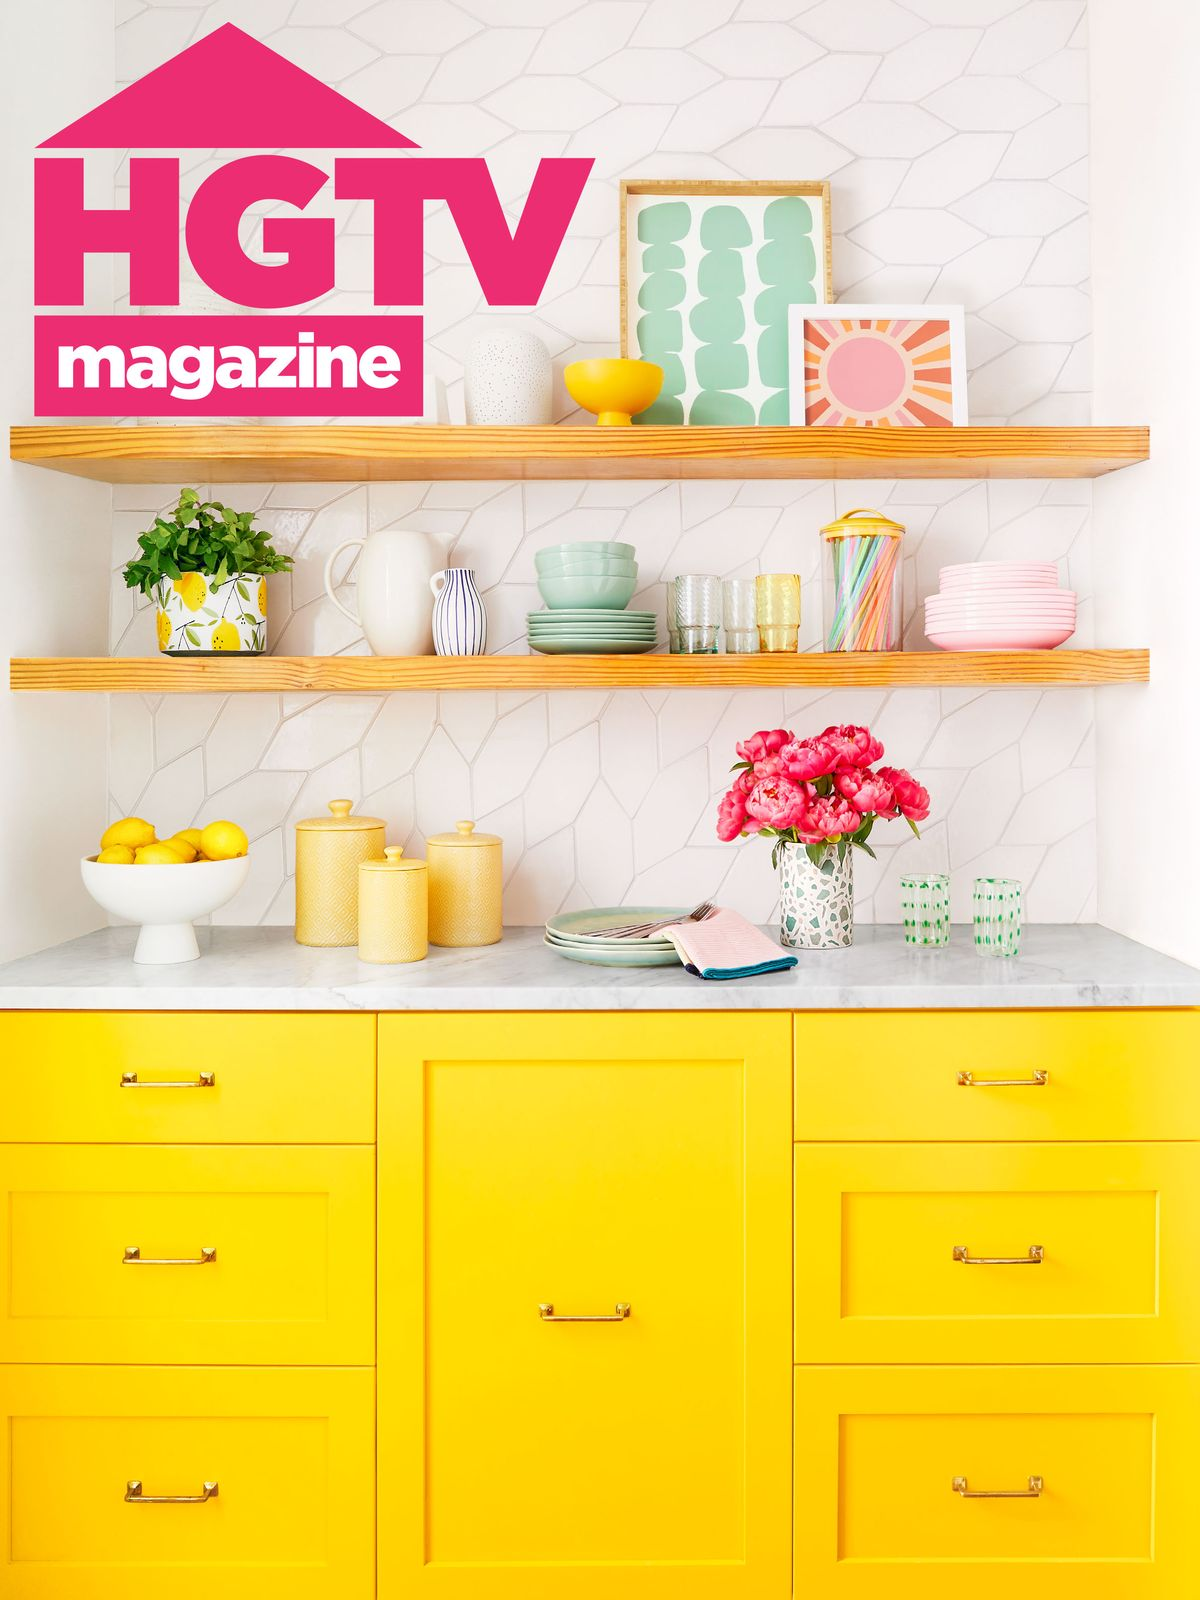 January February 2020 issue of HGTV Magazine